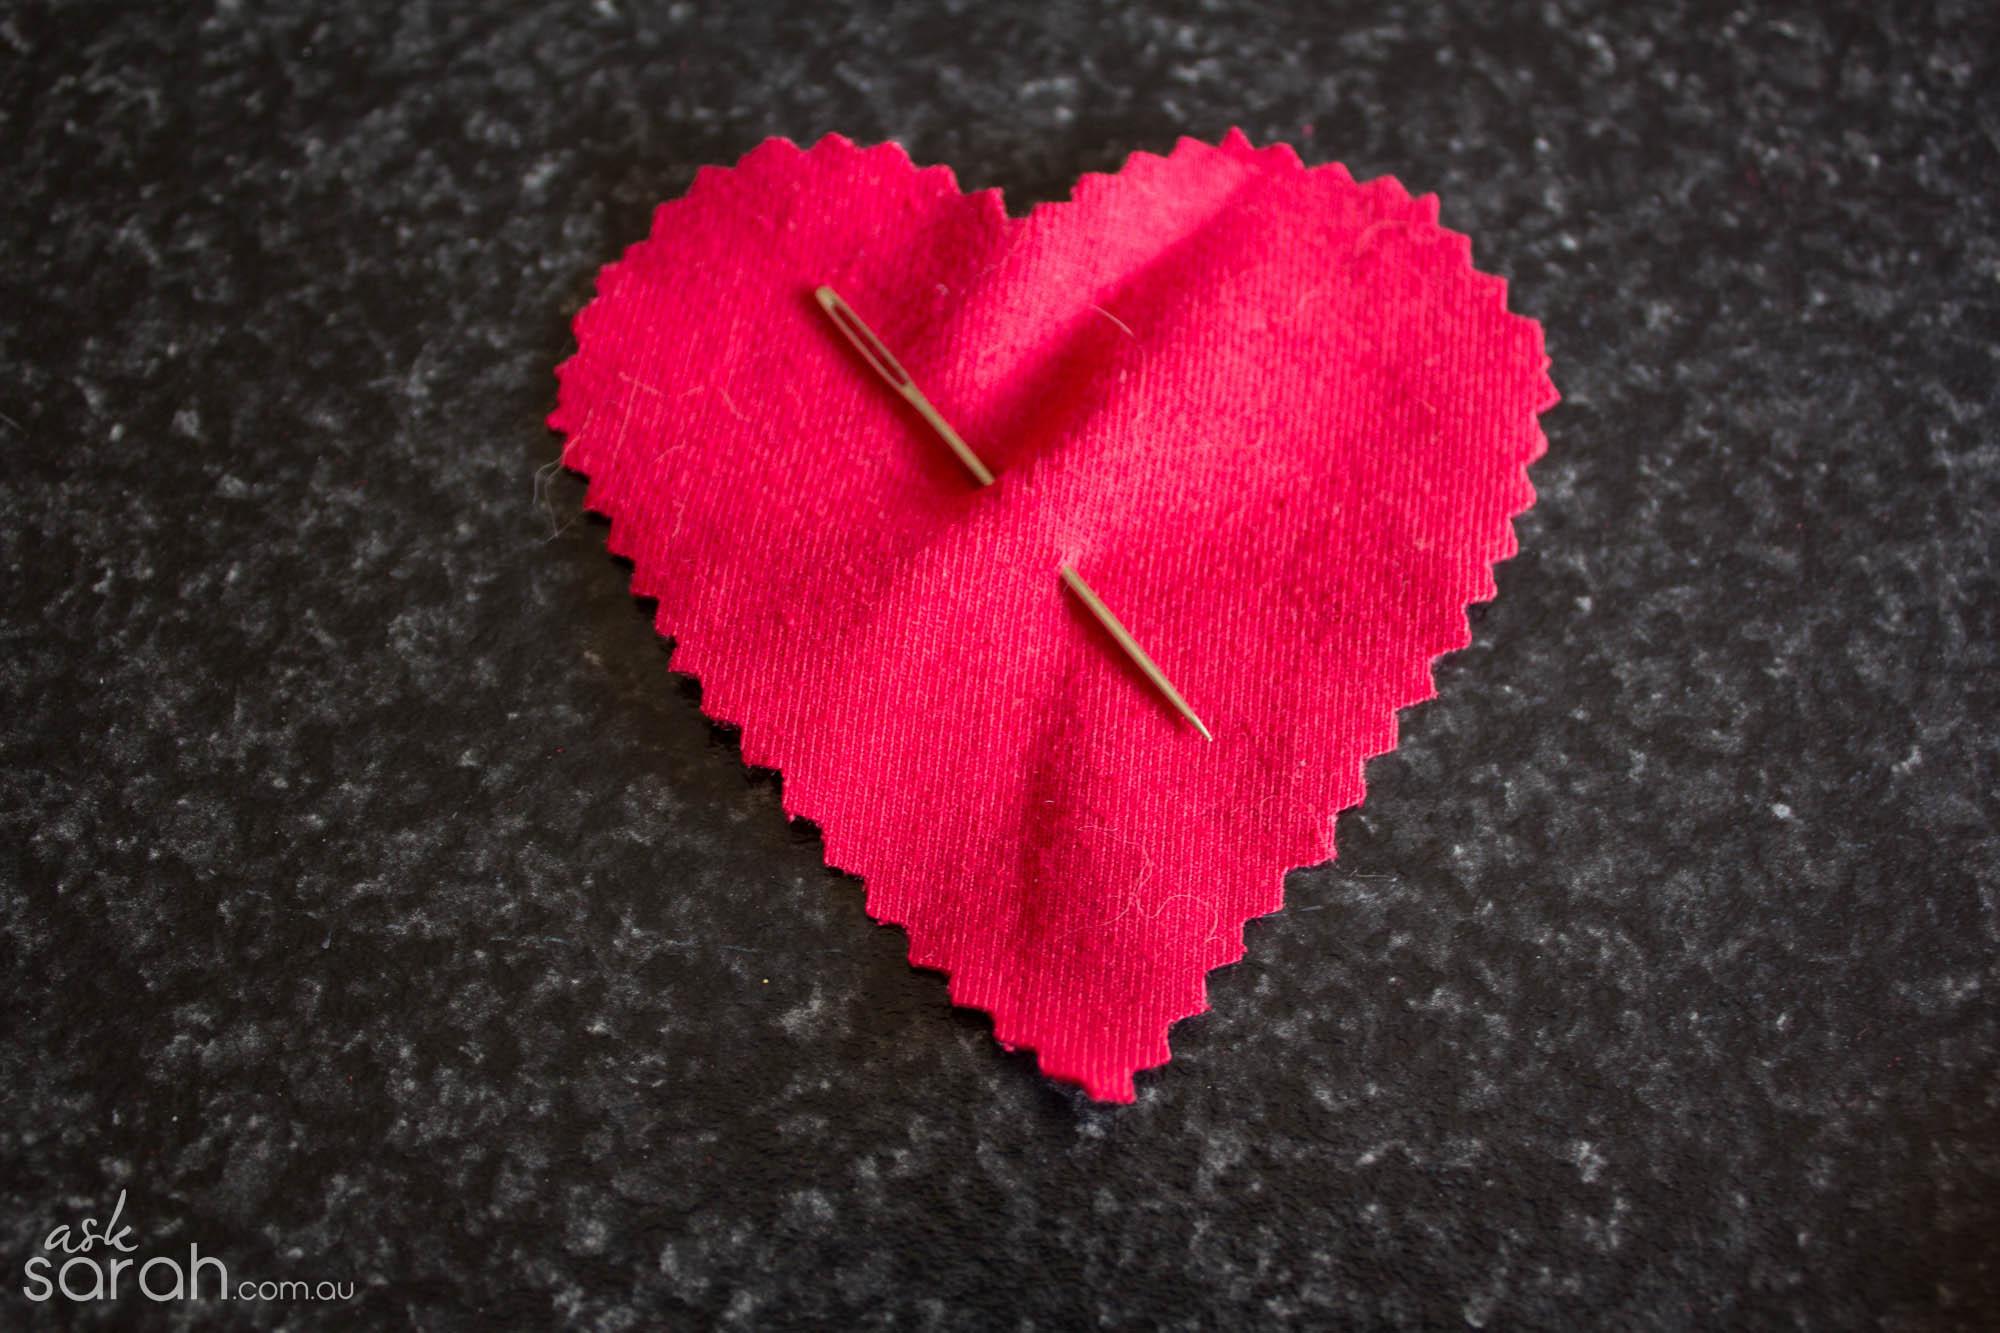 DIY: I Heart Sewing {Halloween Fabric Heart Body Patch w Needle, Thread & Fake Blood}